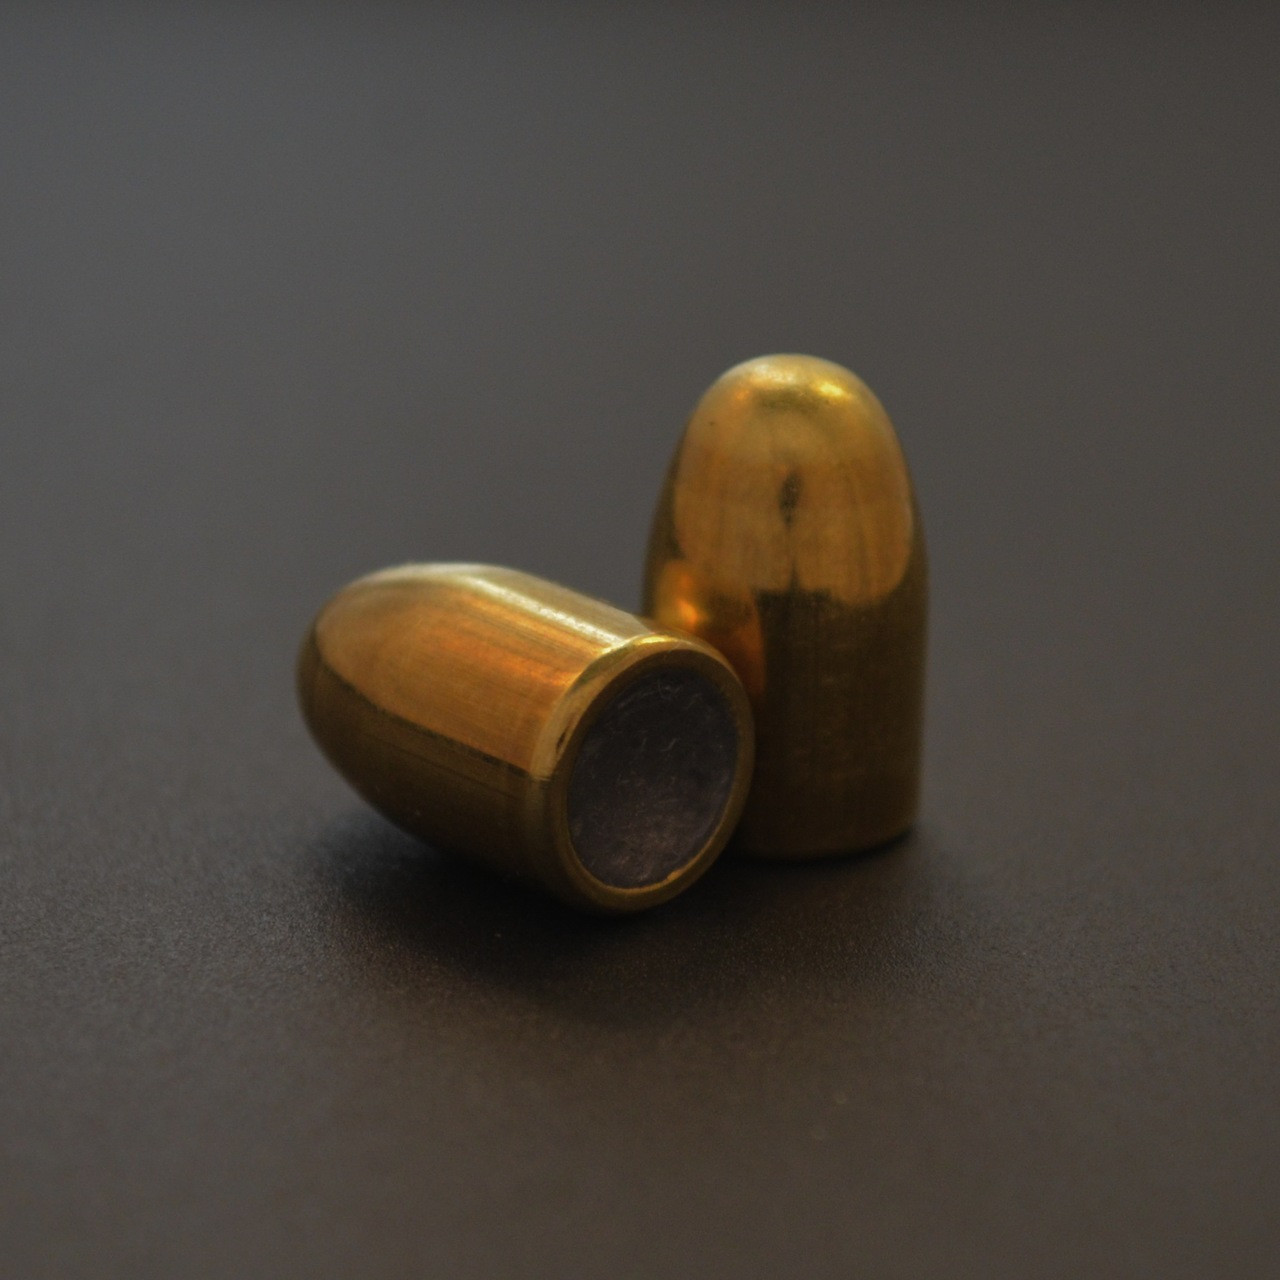 9mm/130gr Super FMJ - 1,000ct